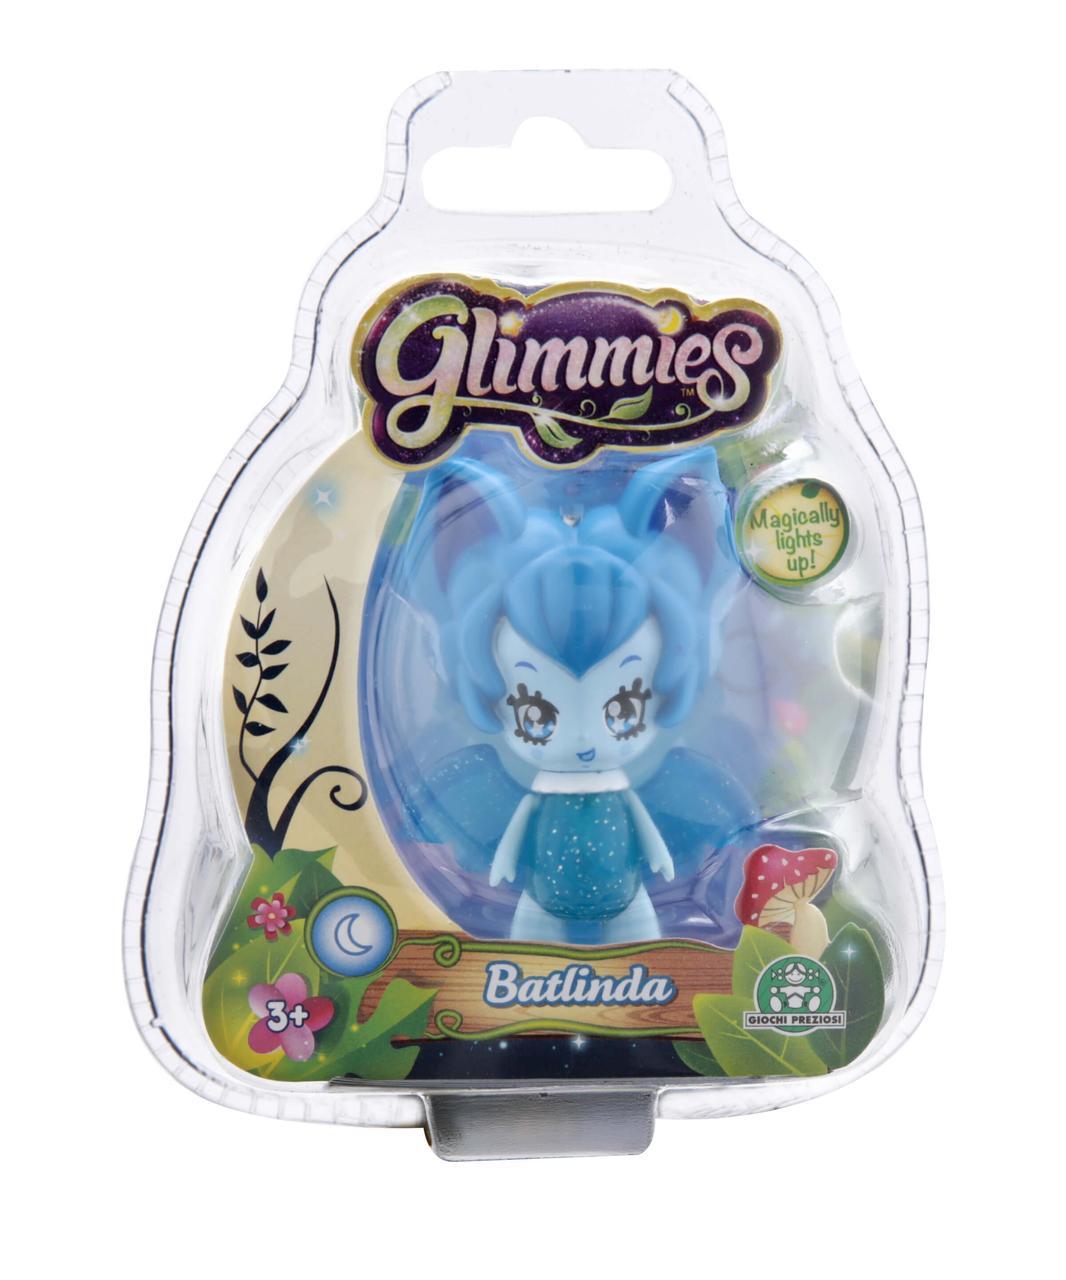 Кукла Glimmies Batlinda 6 см, в блистере